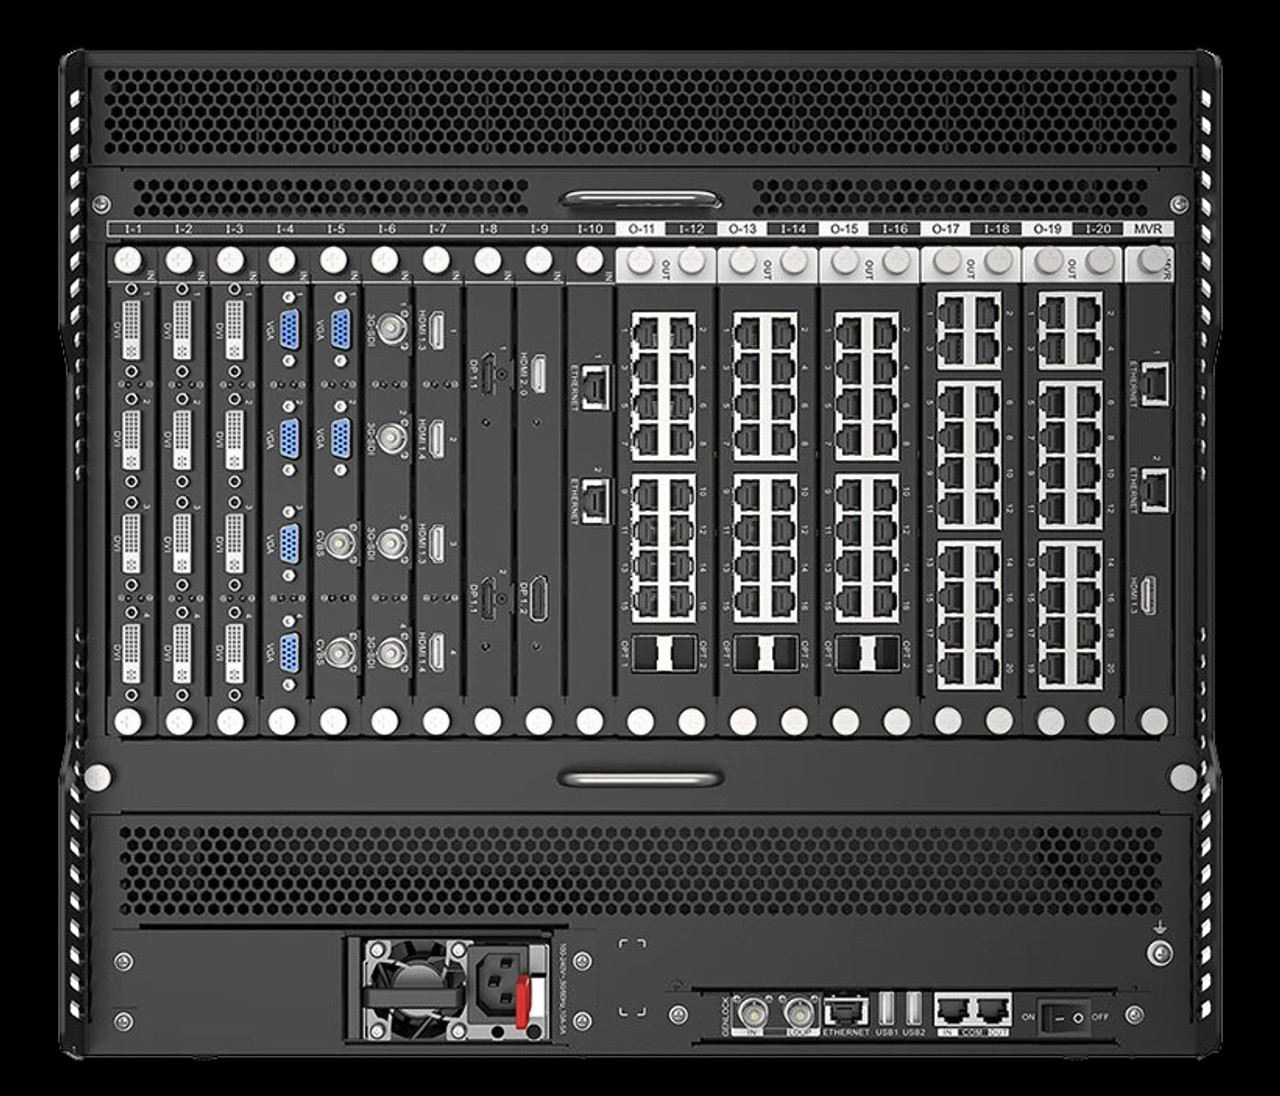 NovaStar H9 All-in-one Video Splicing Processor